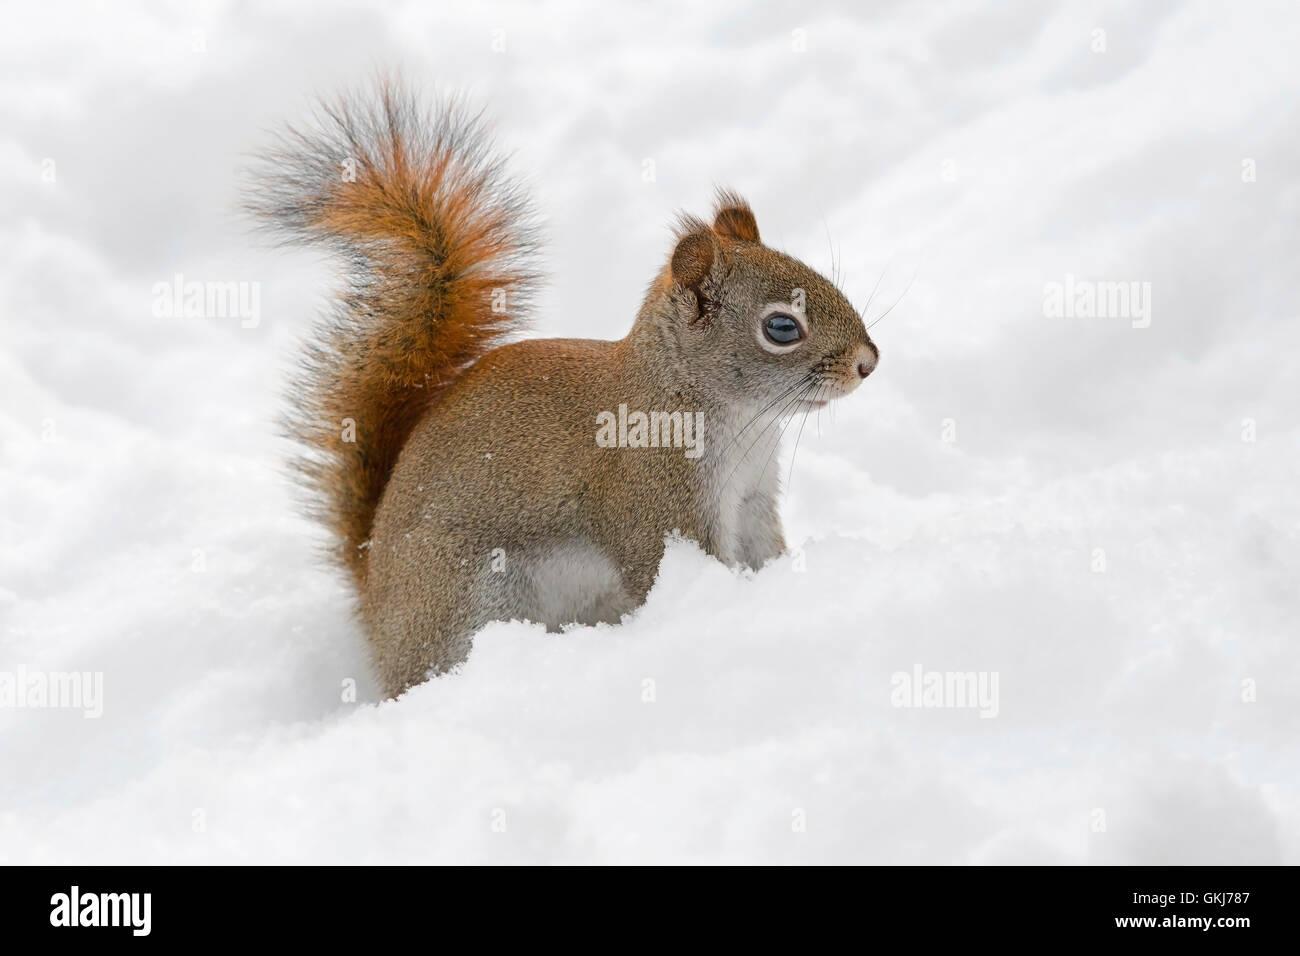 Red Squirrel (Tamiasciurus or Sciurus hudsonicus) looking for food in fresh snow, Eastern USA Stock Photo